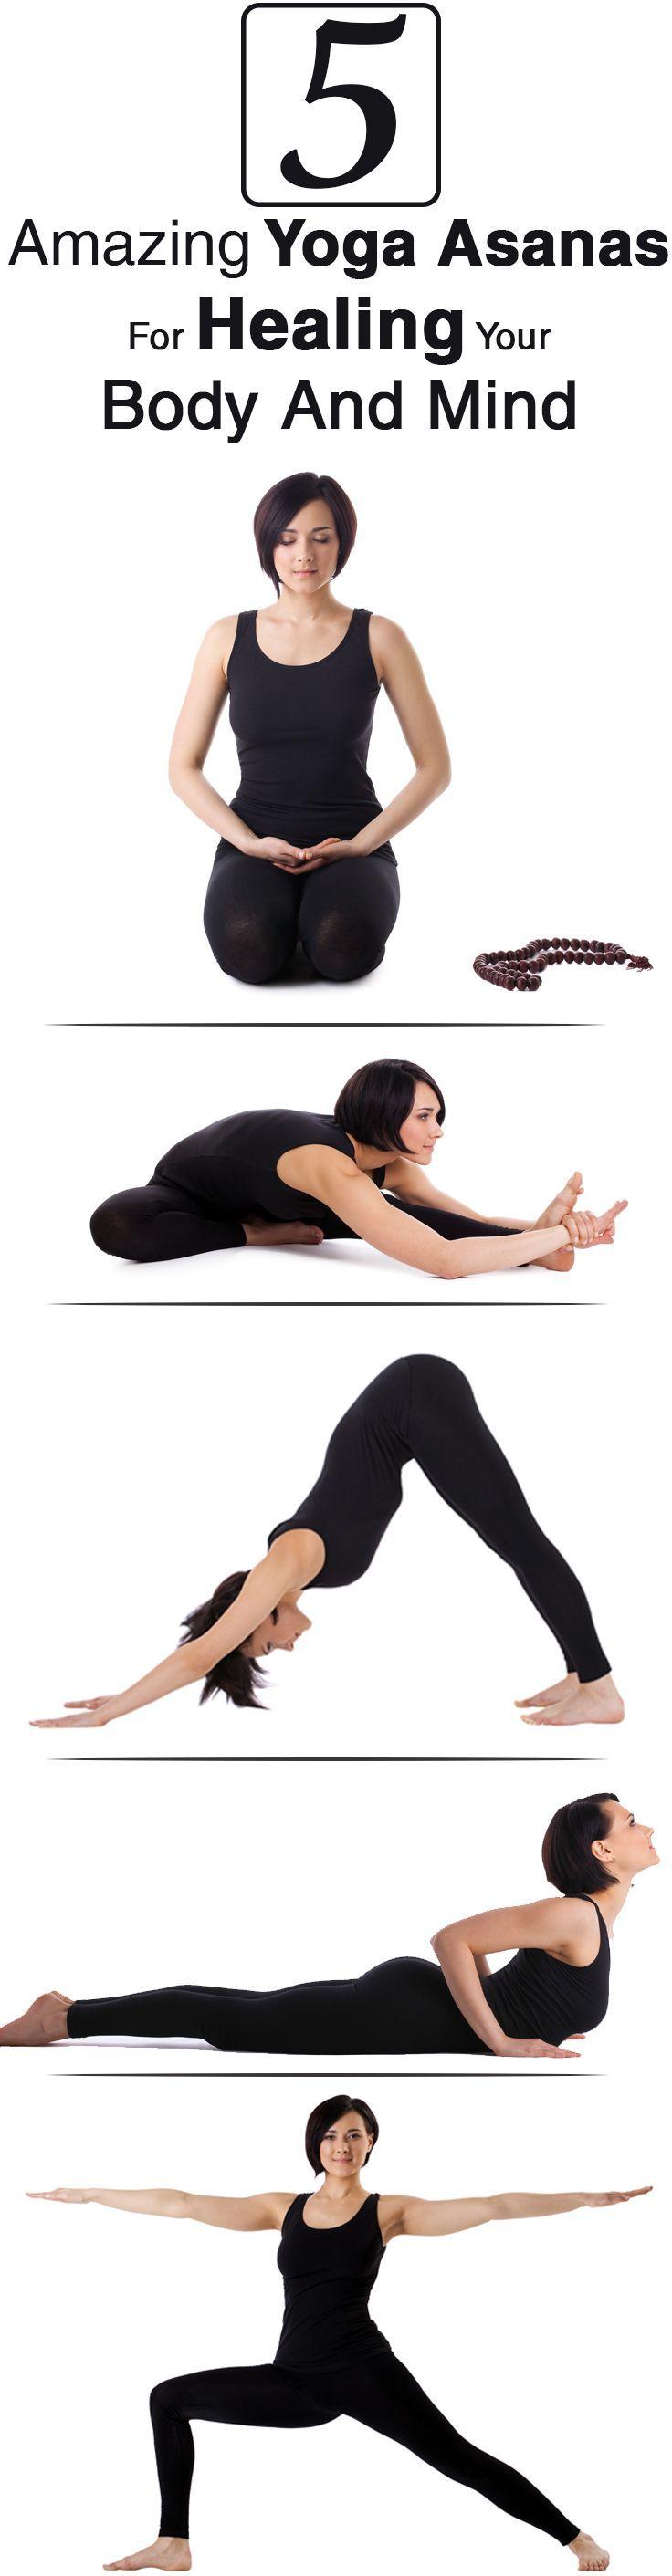 4 Effective Yoga Asanas To Improve Mental Health